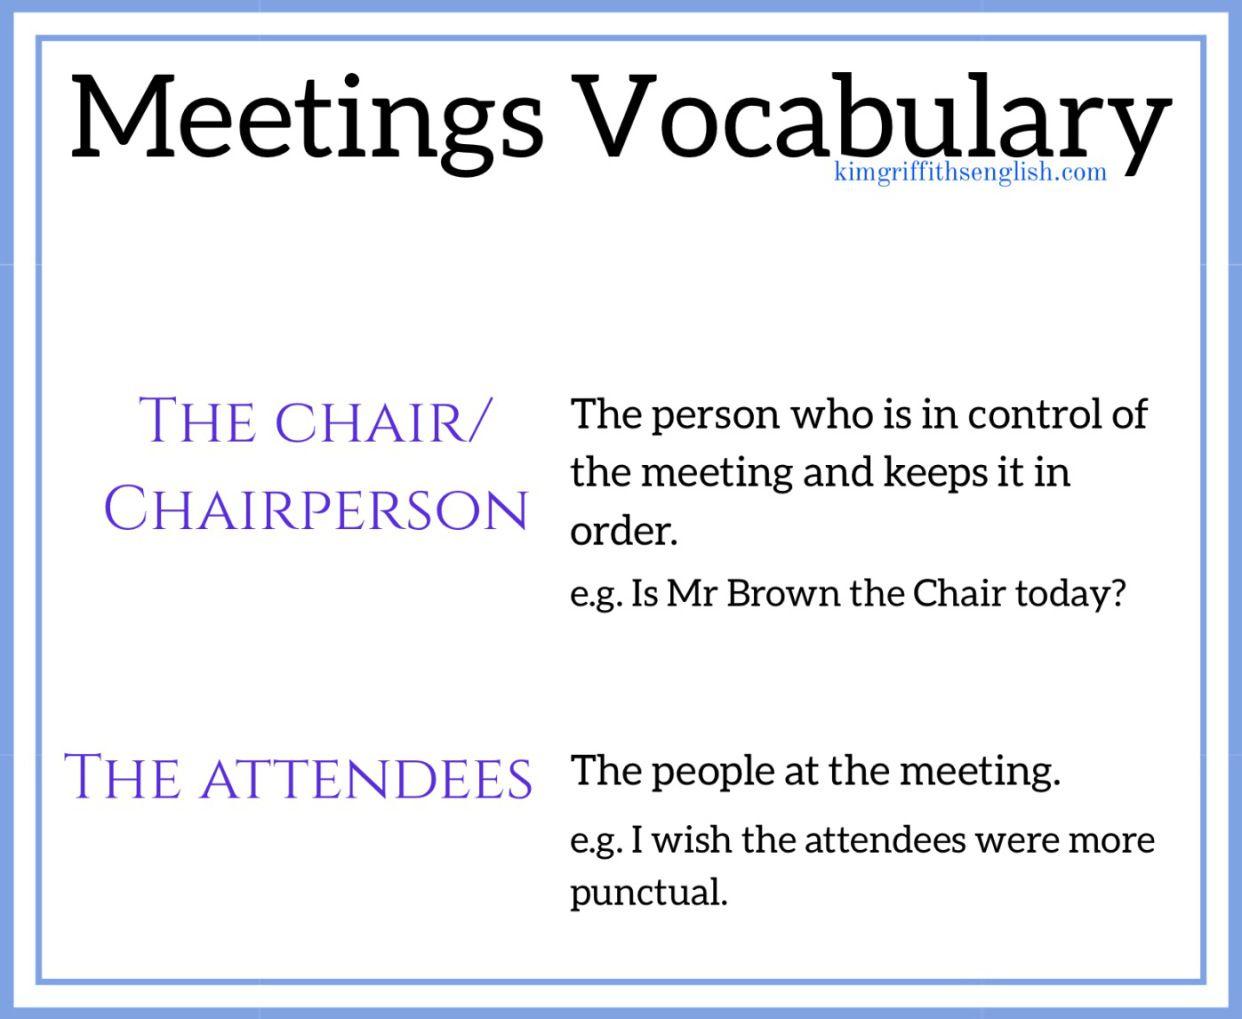 Meetings English Kimgriffithsenglish People Advanced English Vocabulary Meet English At meeting or in meeting